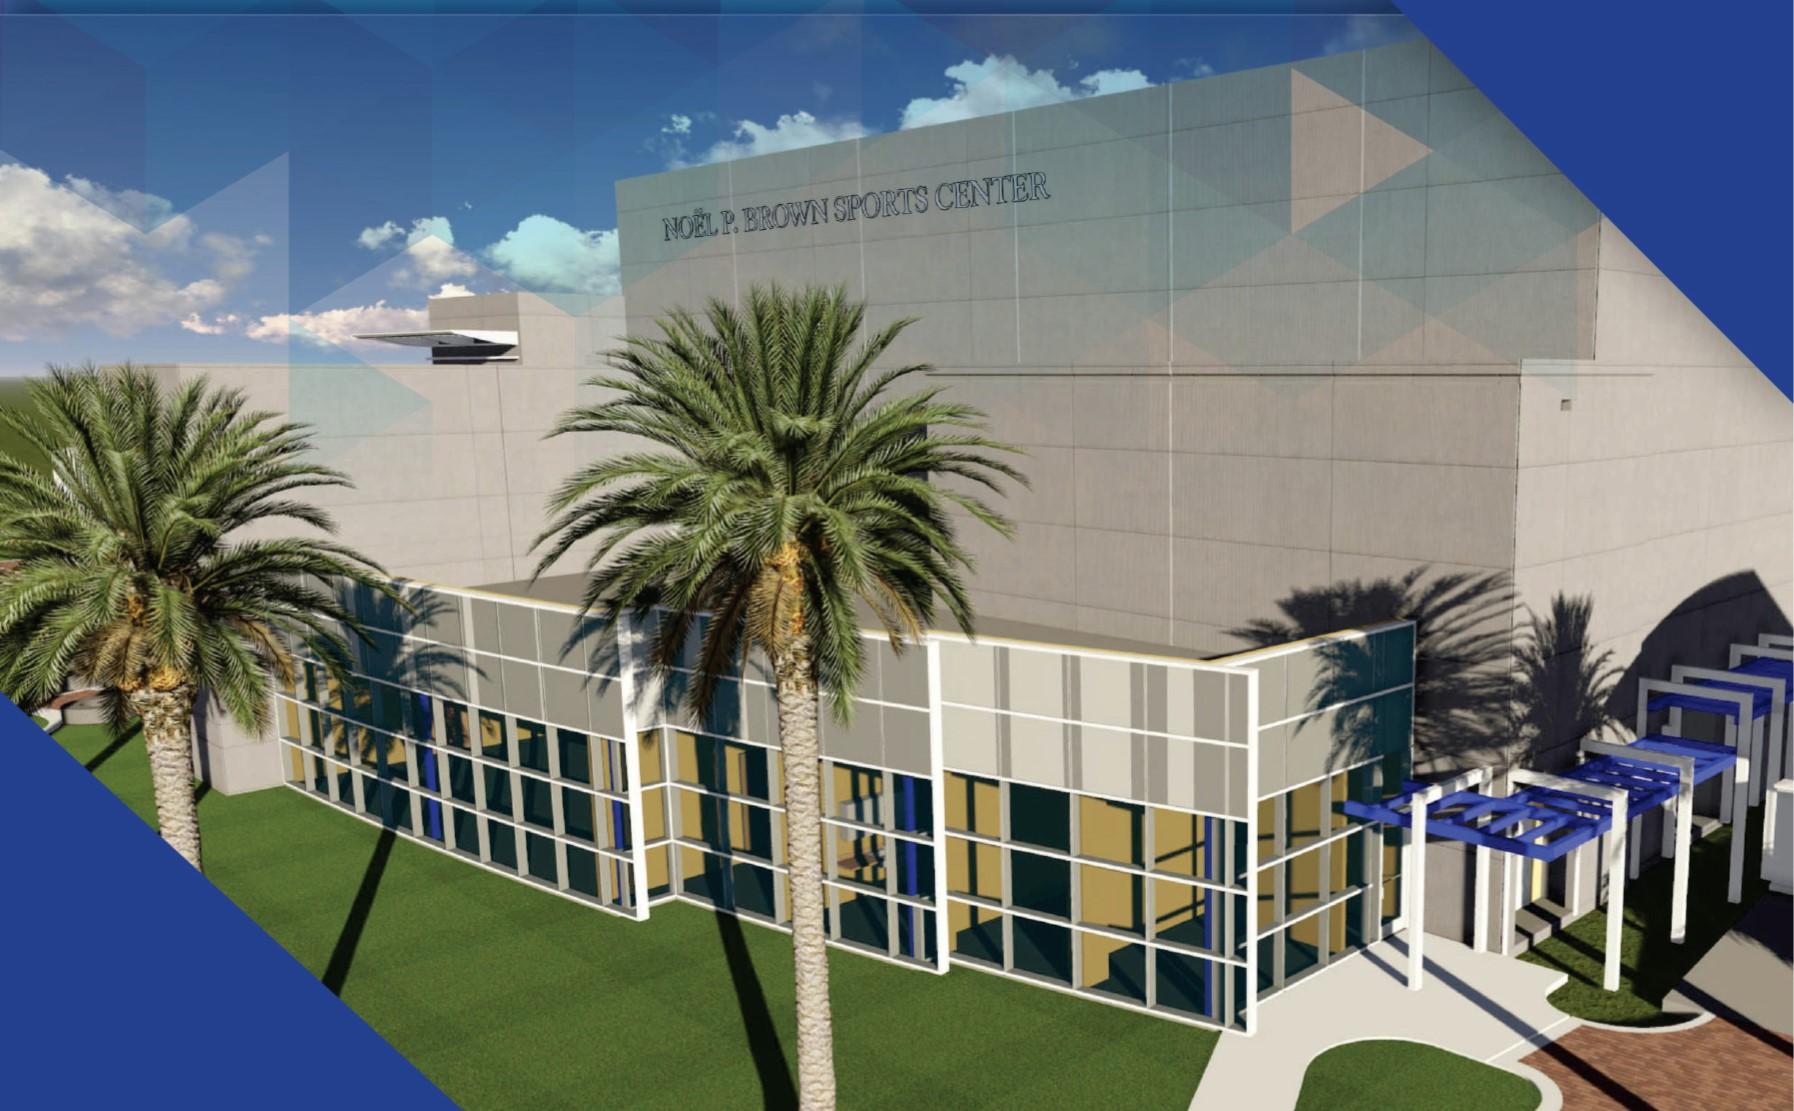 Noel P. Brown Sports Center Dedication